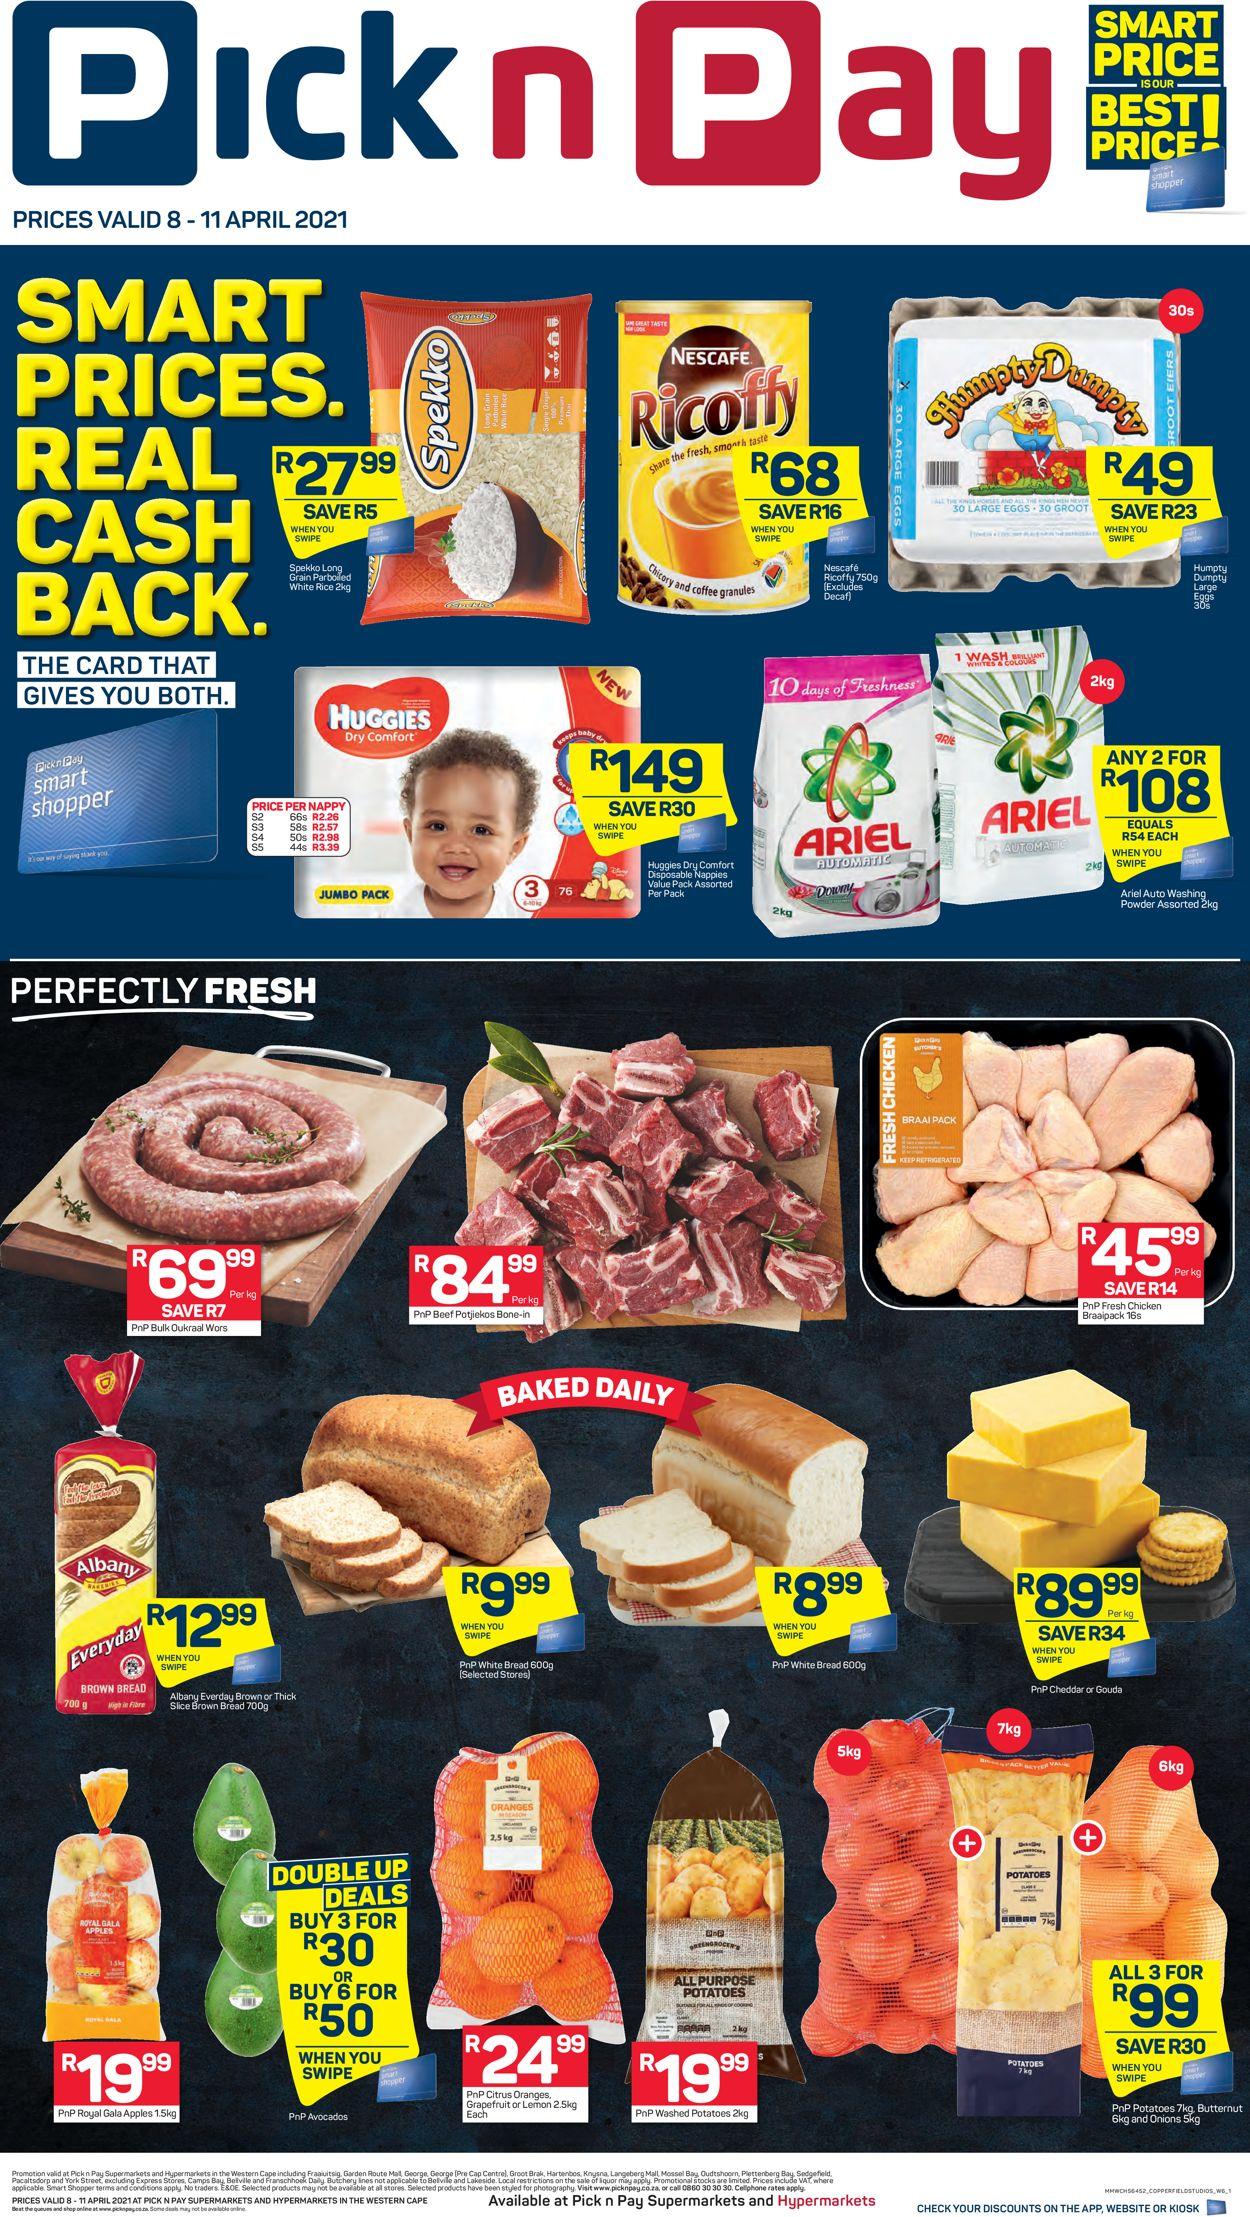 Pick n Pay Catalogue - 2021/04/08-2021/04/11